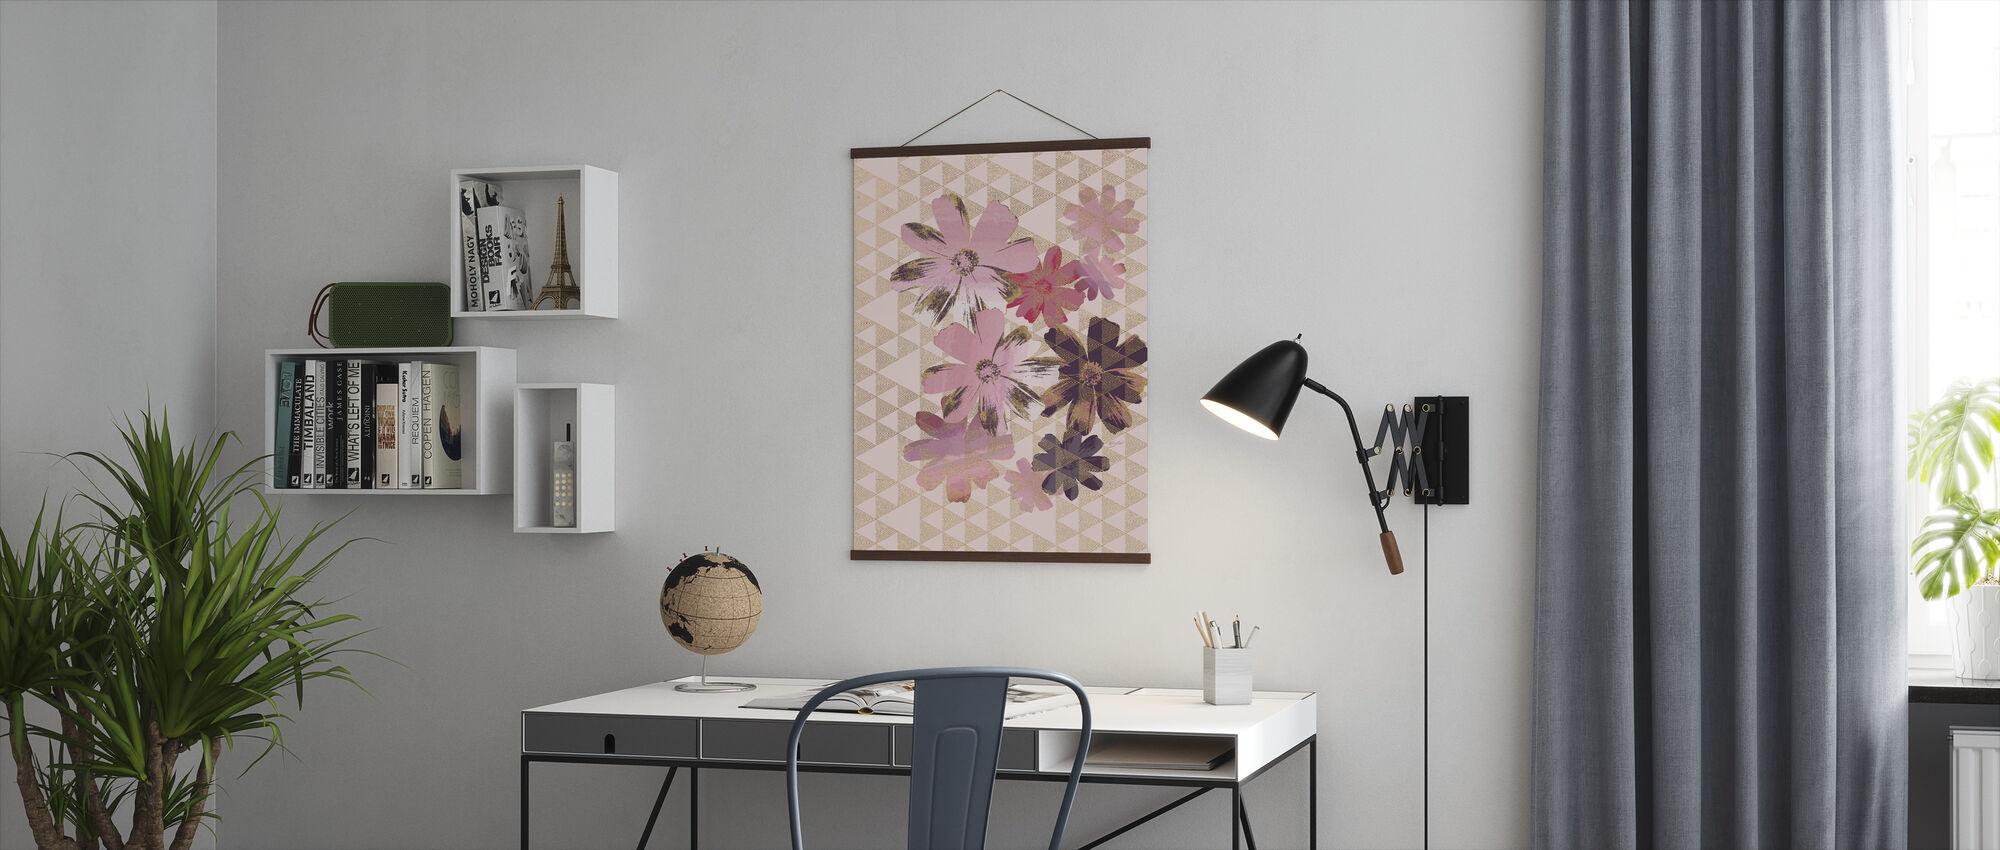 Kimono Tusenfryd 1 - Plakat - Kontor